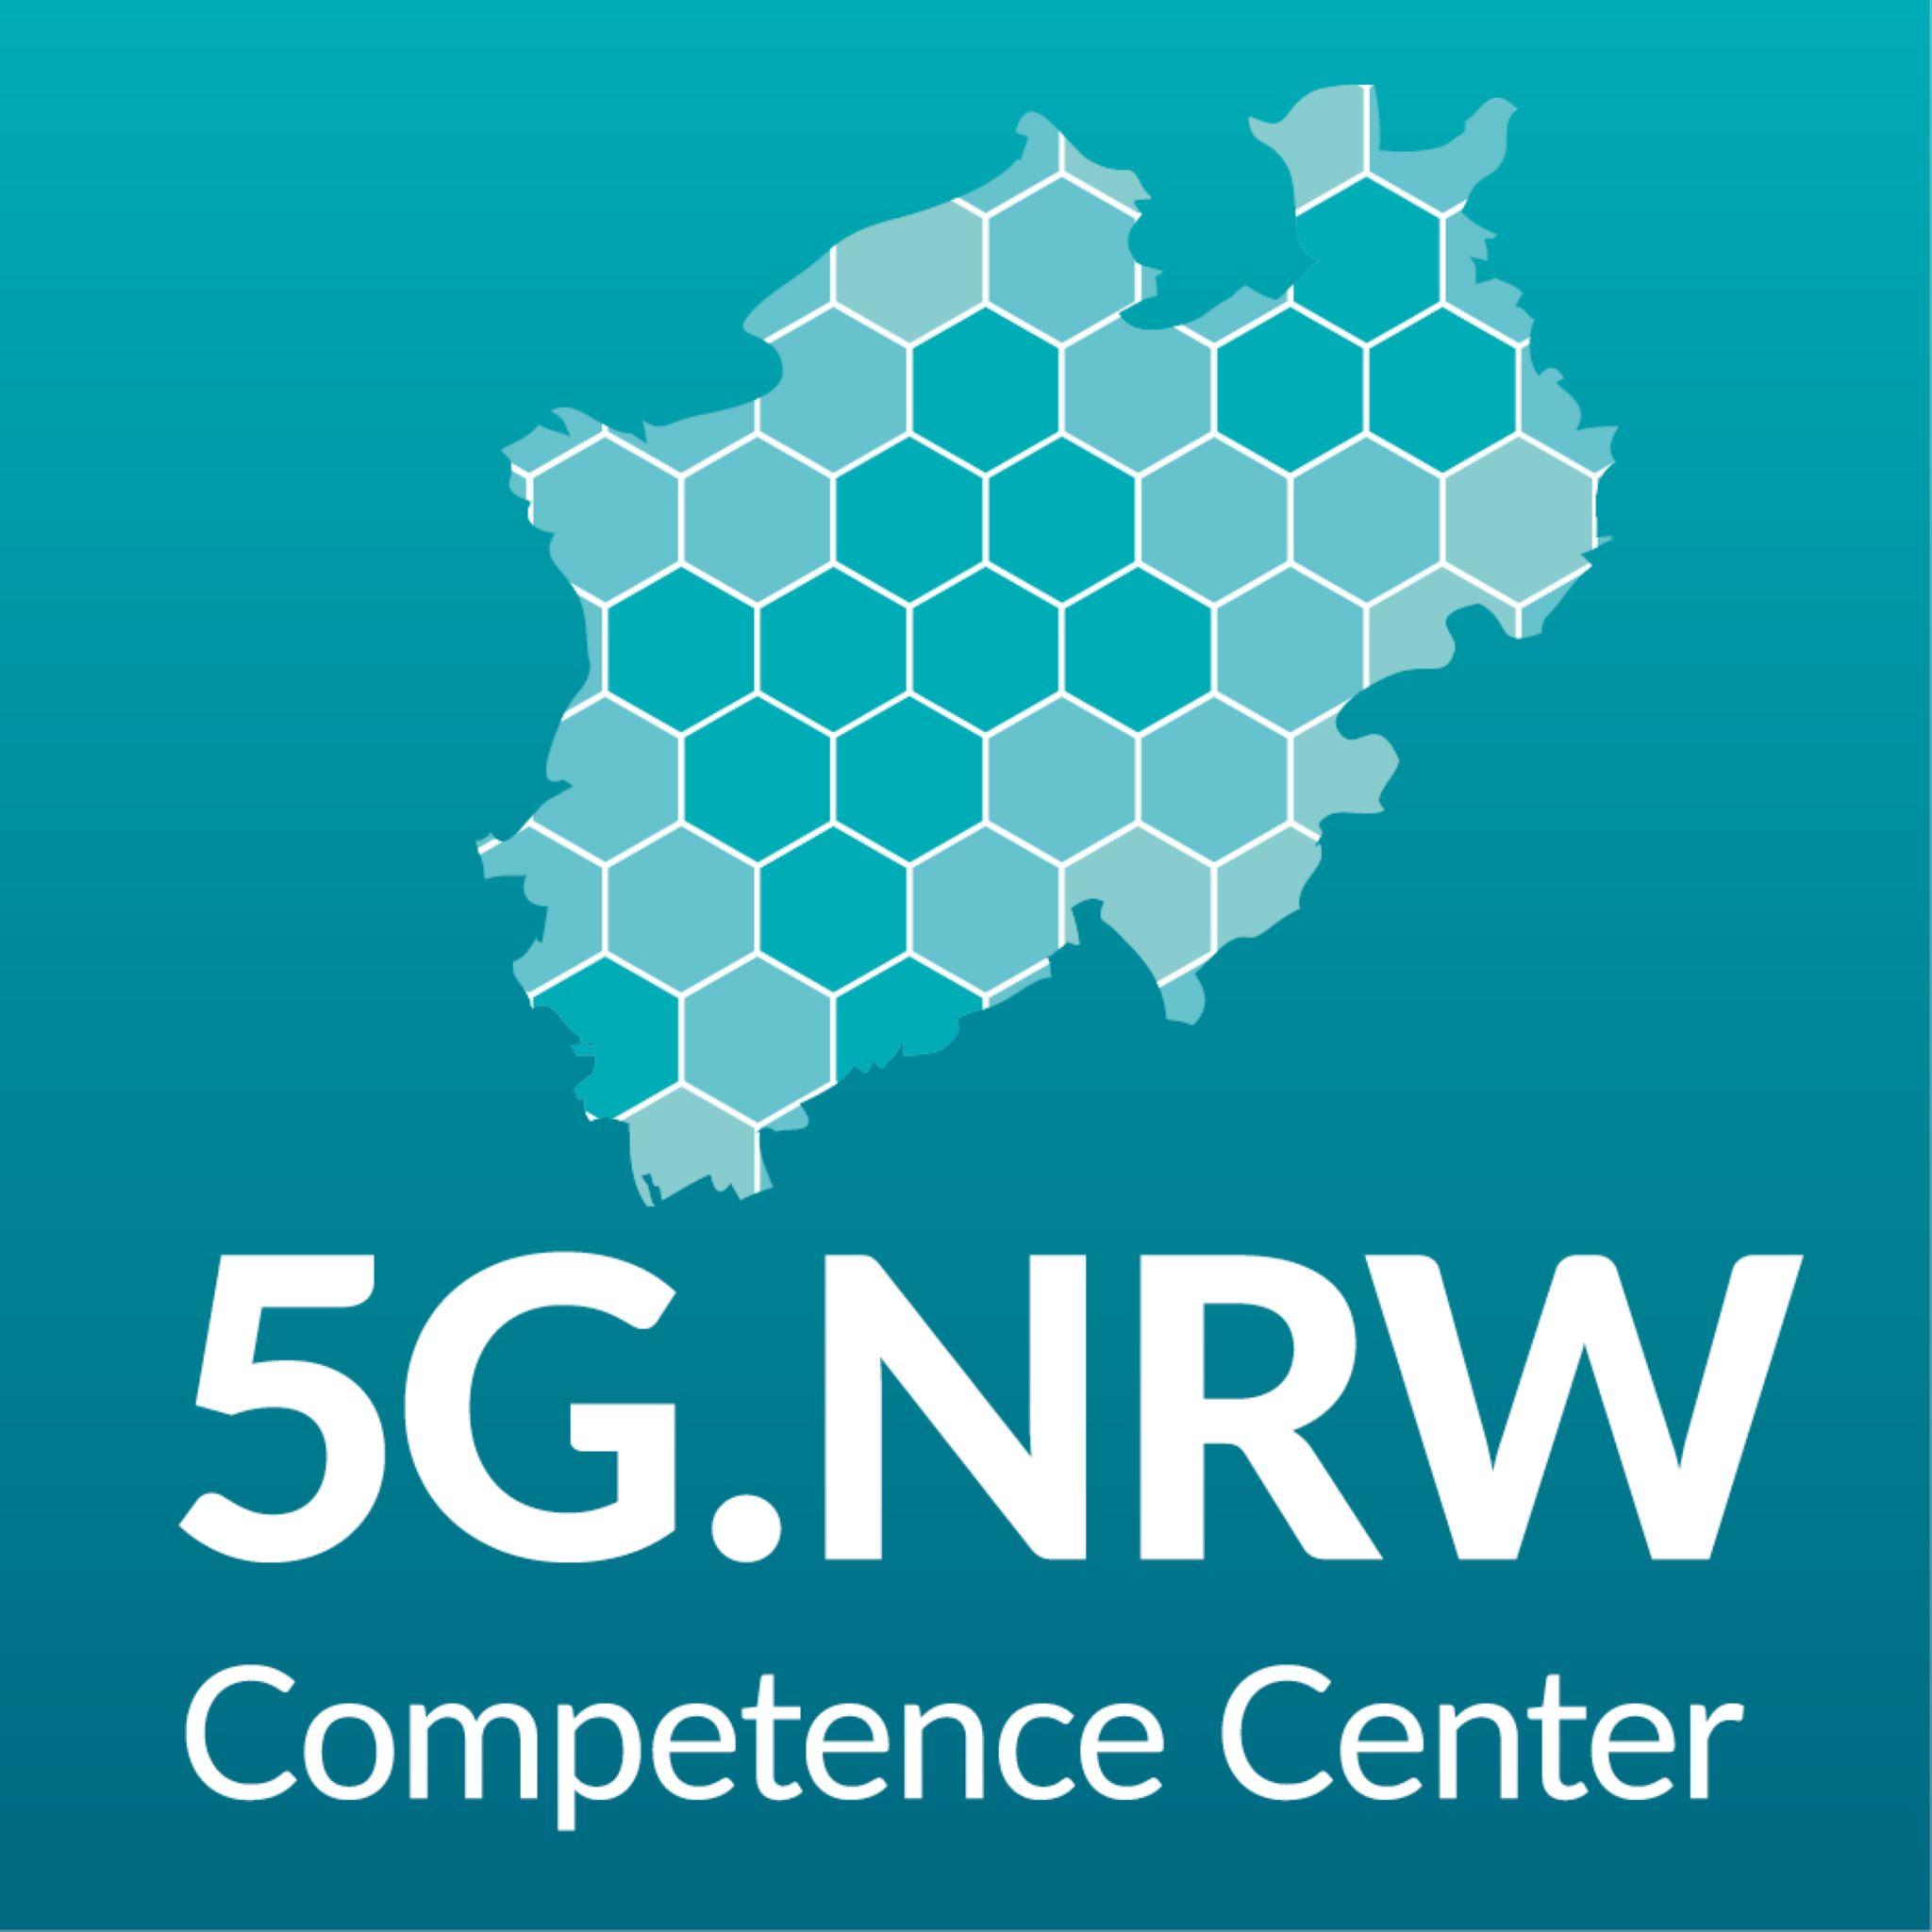 Competence Center 5G.NRW